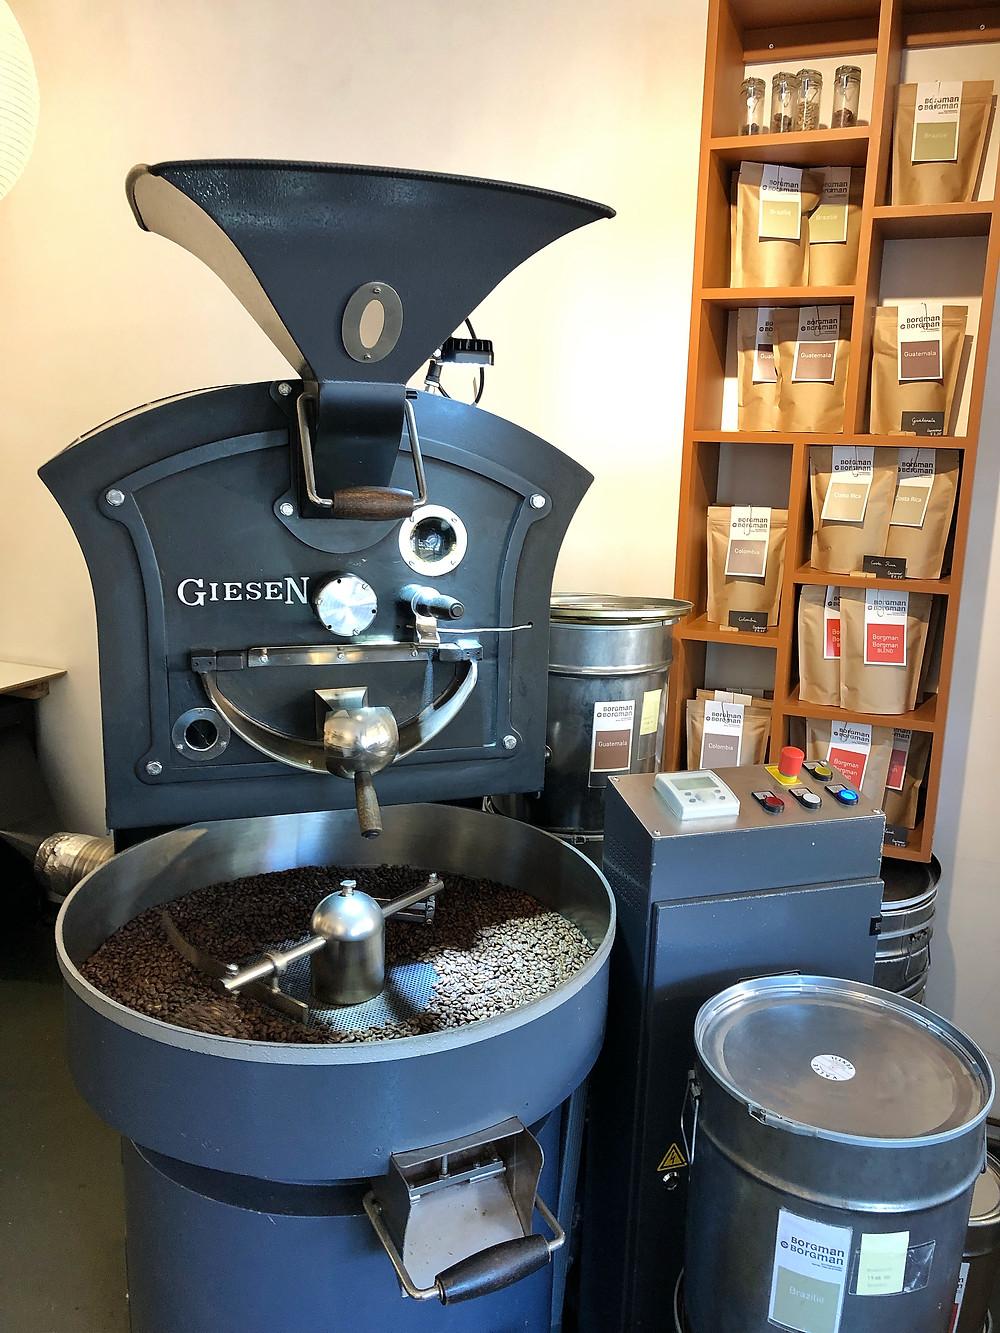 Giesen coffee roaster at Borgman Borgman in Leiden